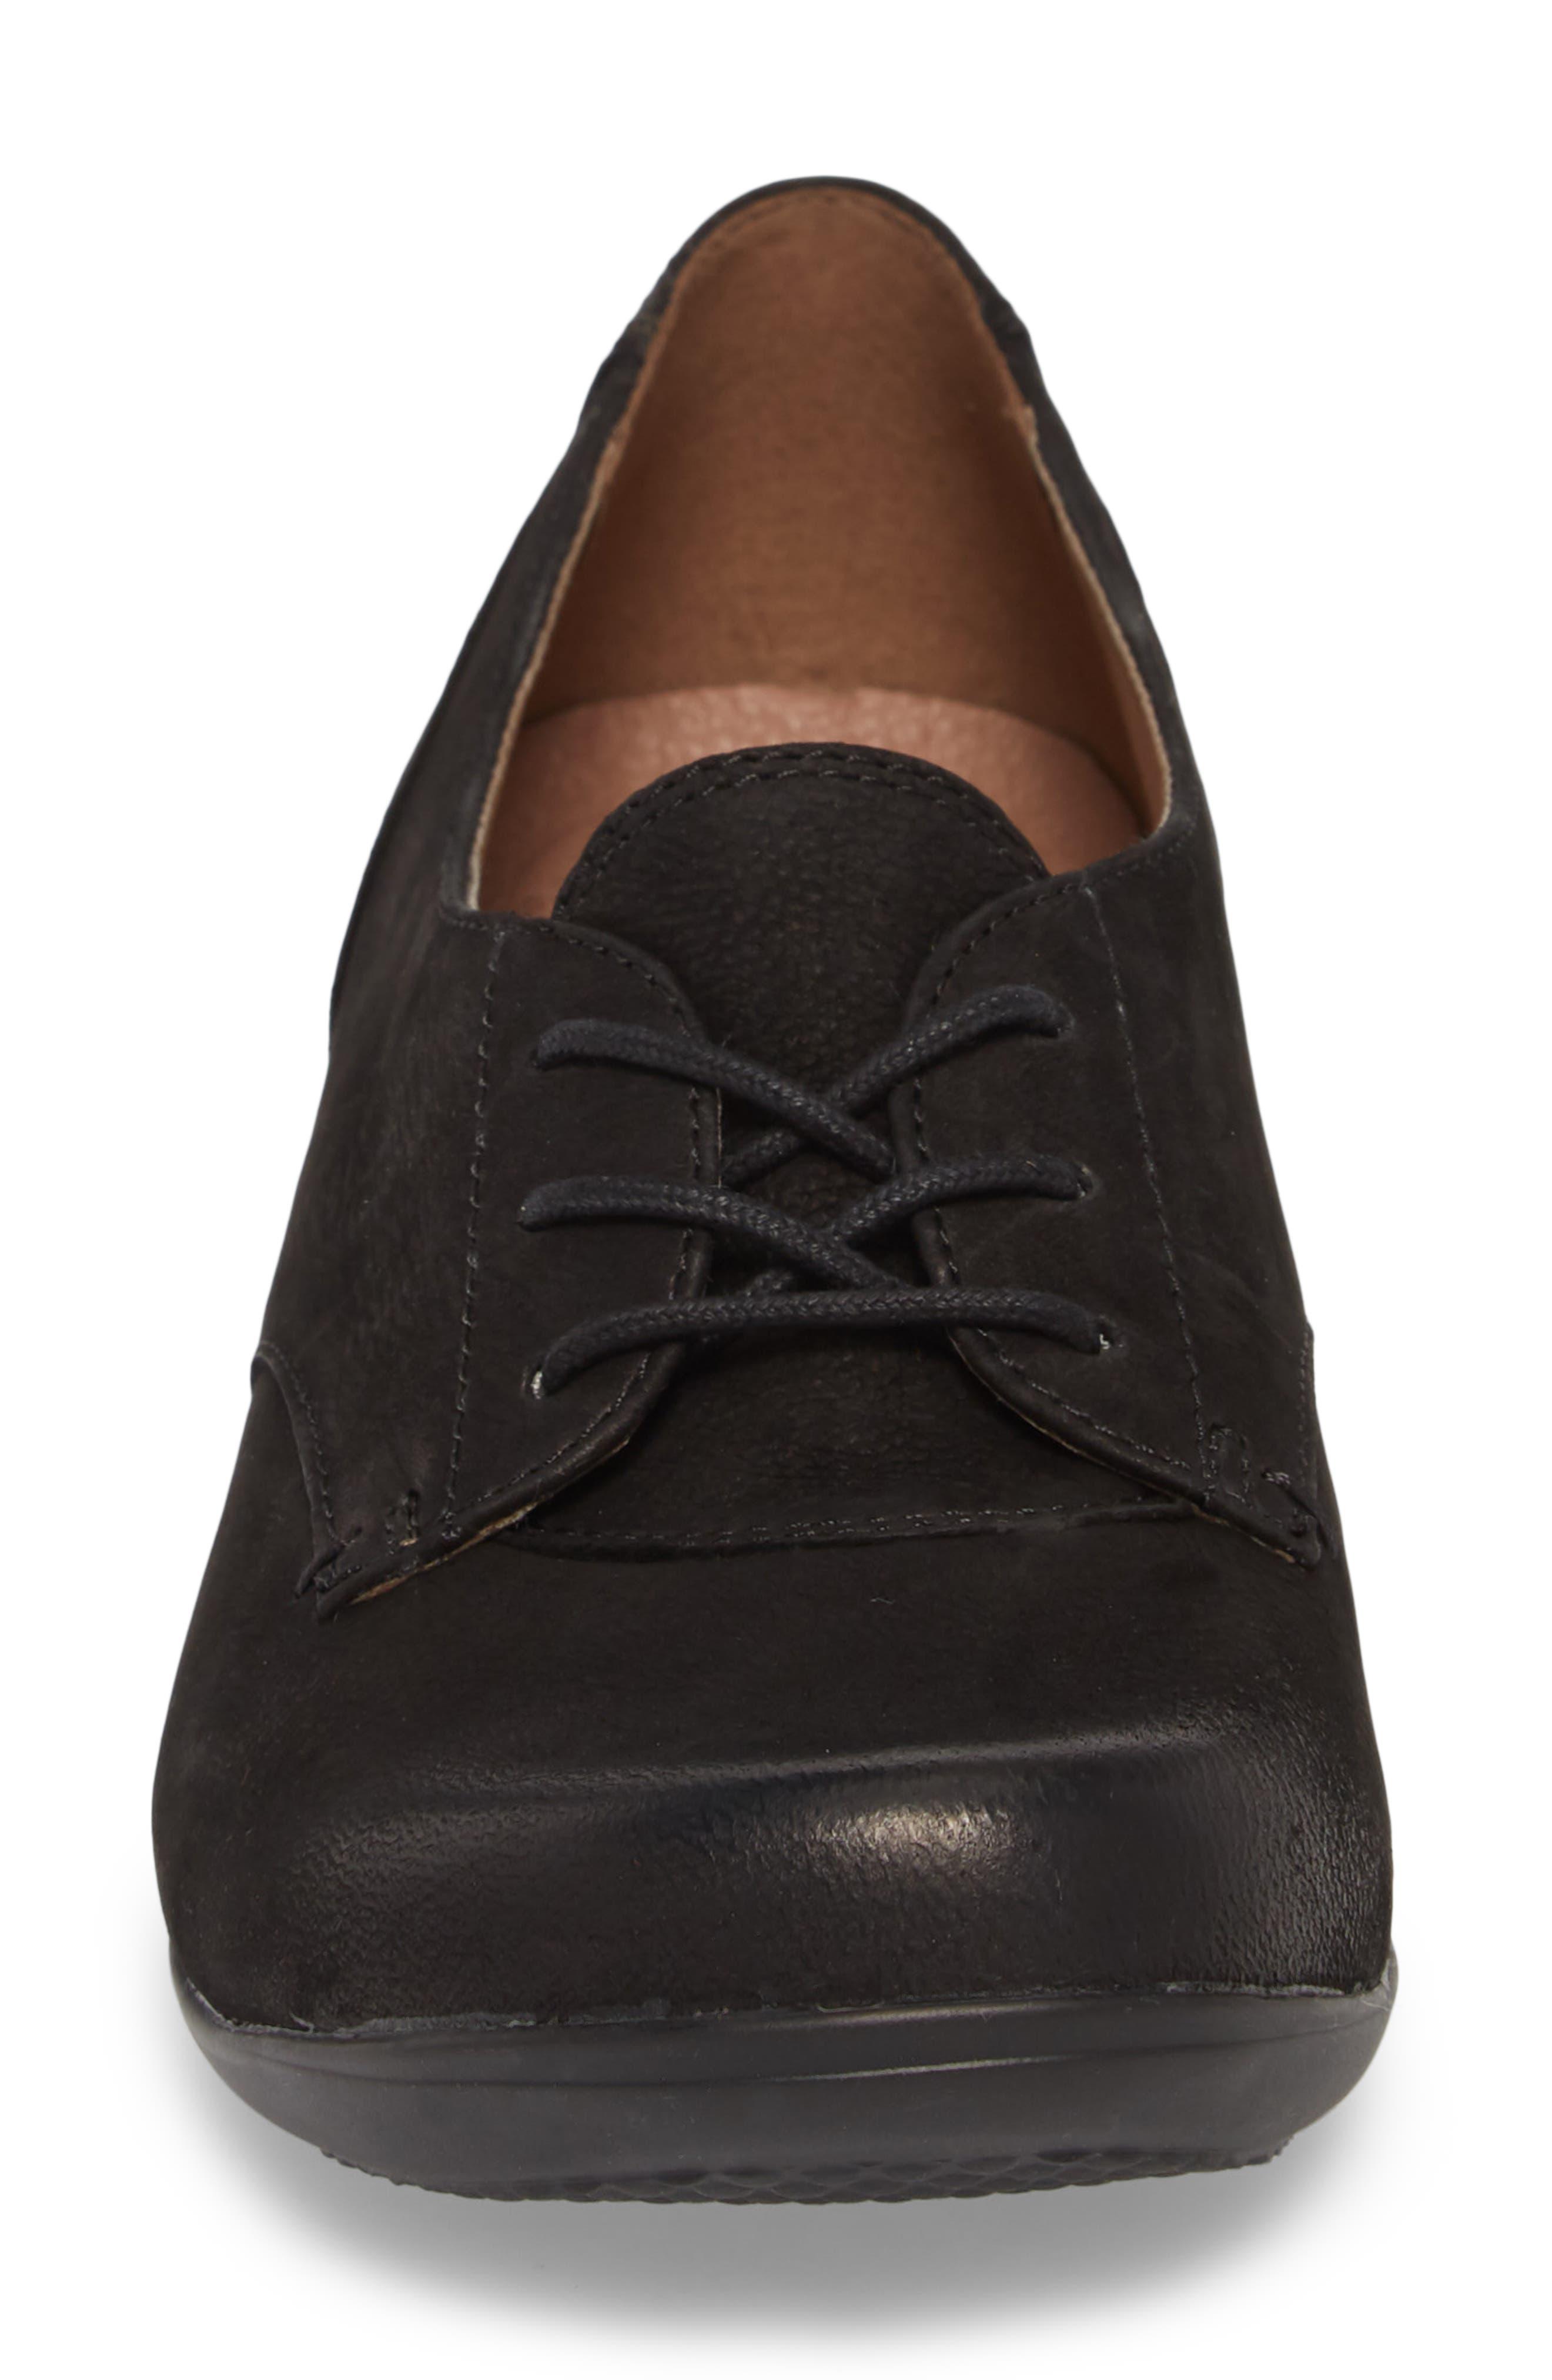 Fallon Derby,                             Alternate thumbnail 4, color,                             Black Burnished Nubuck Leather